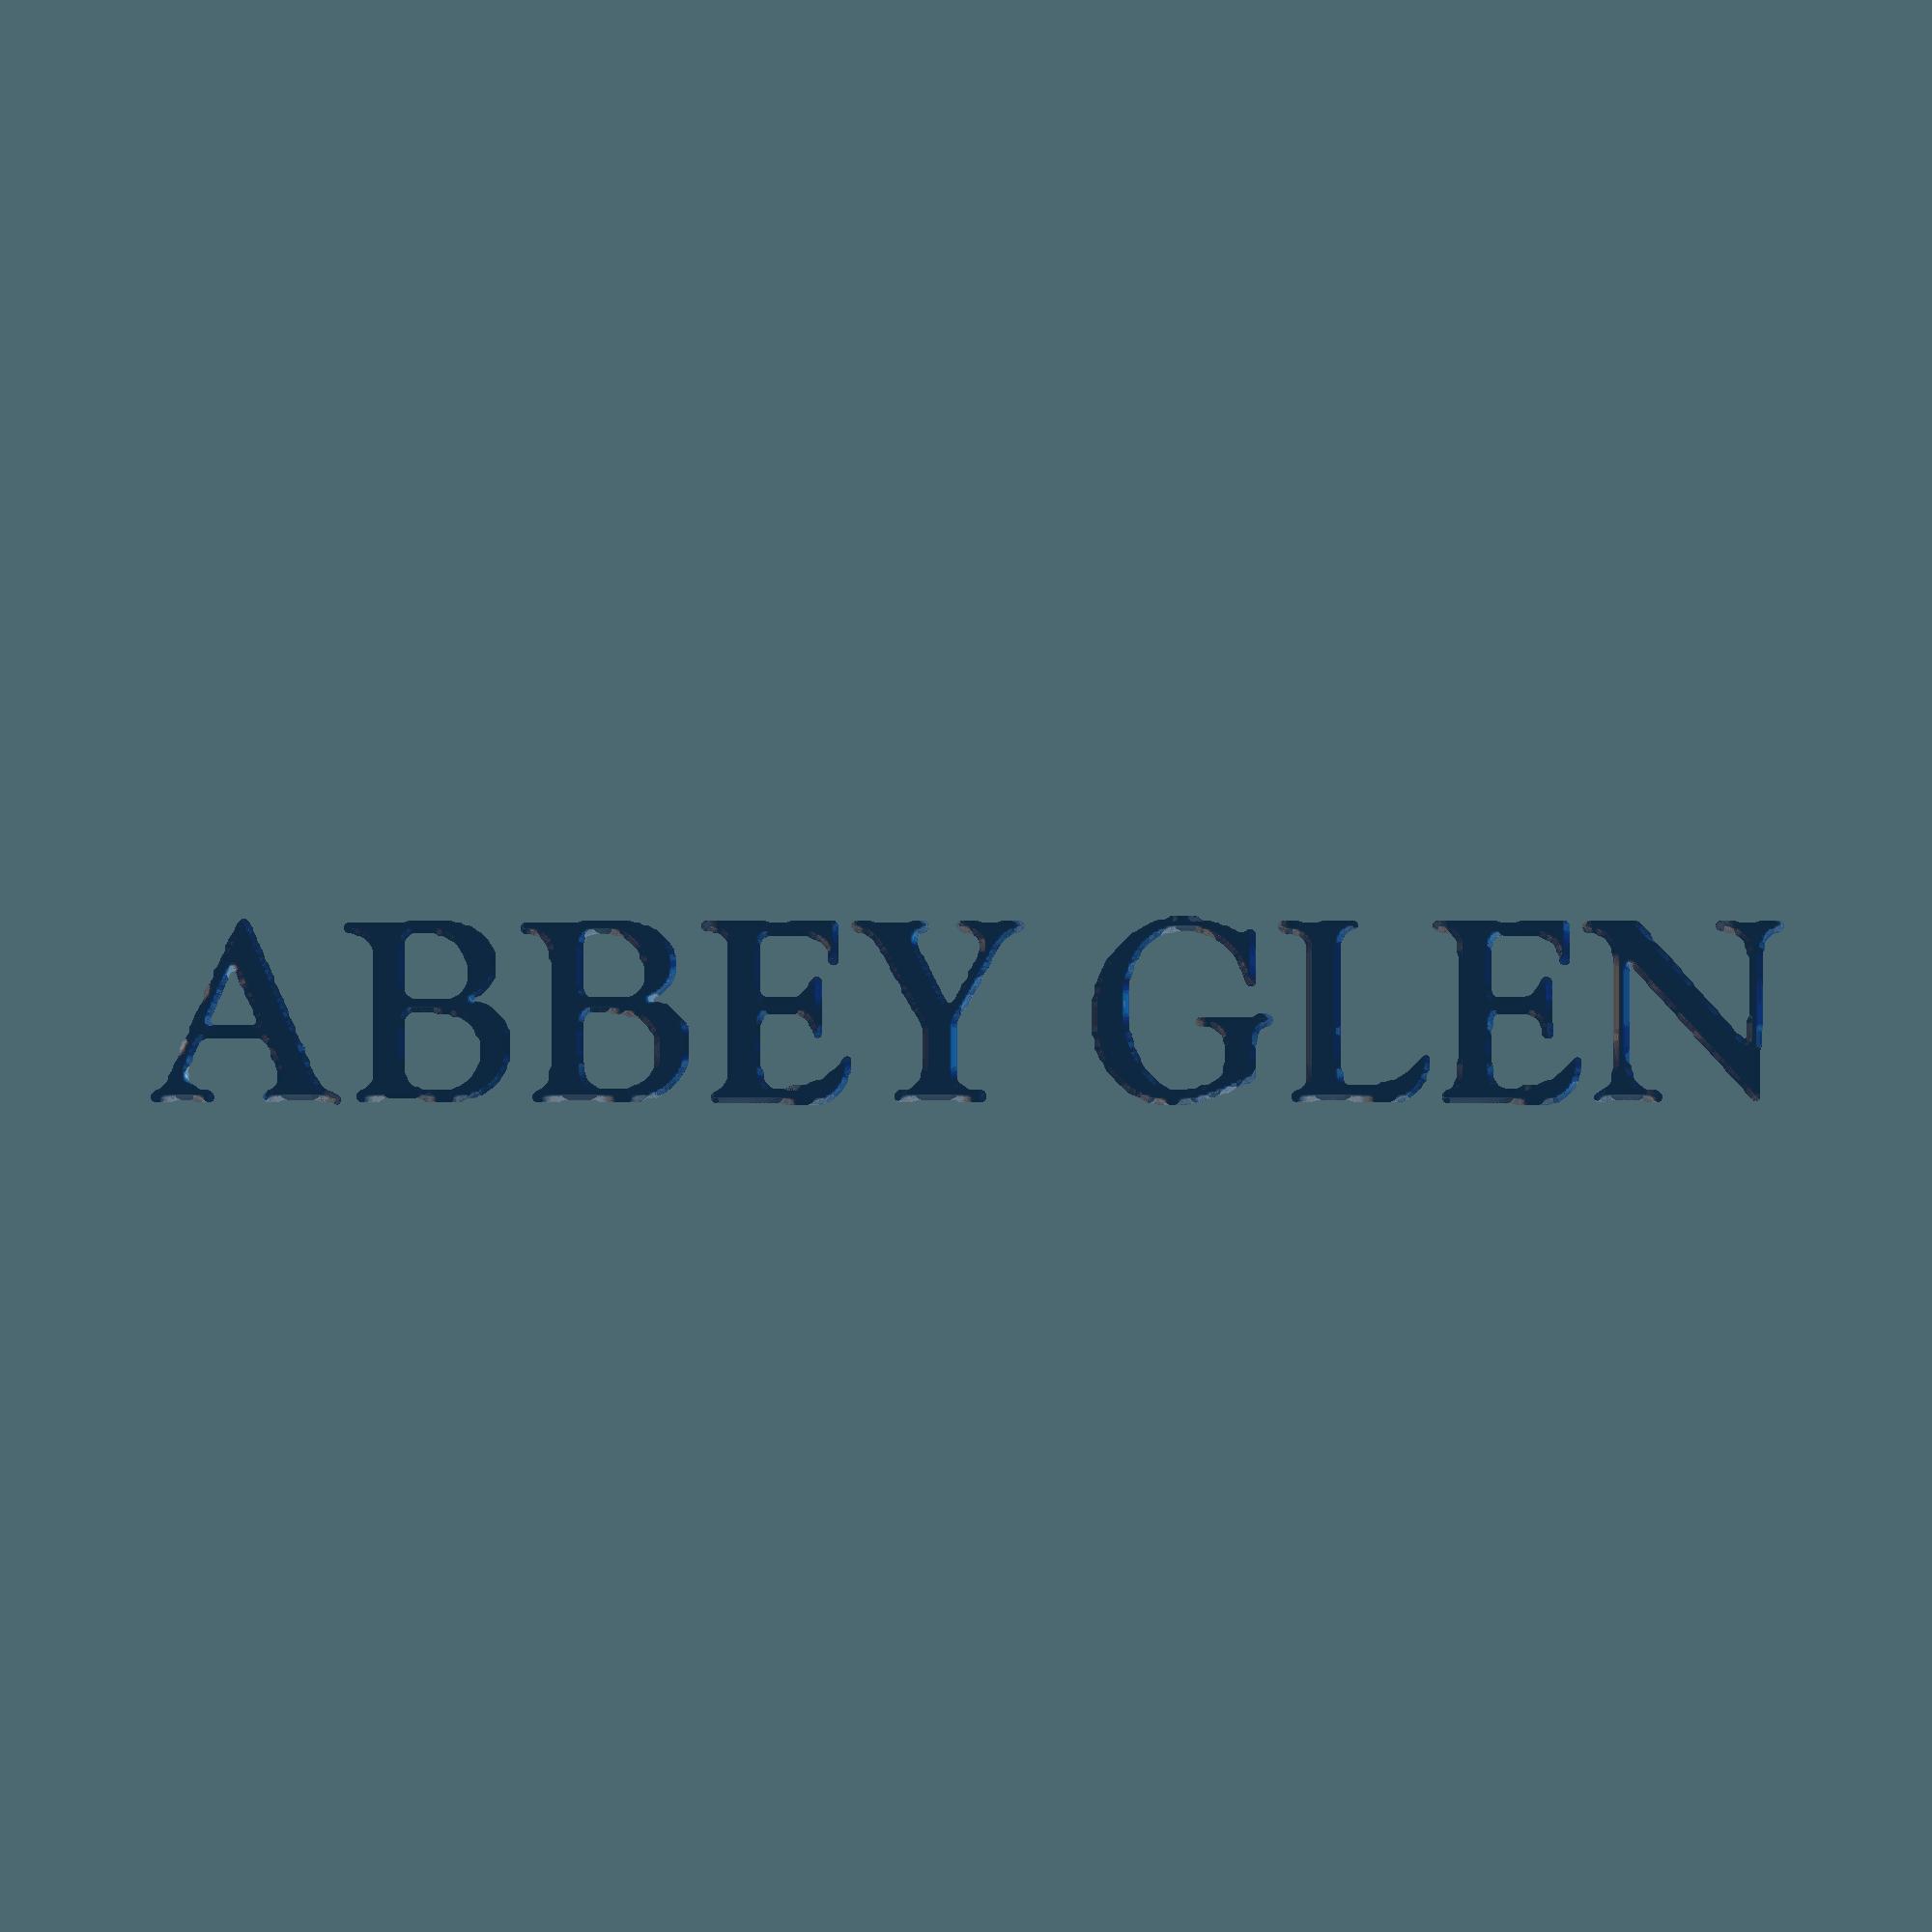 ABBEY GLEN color